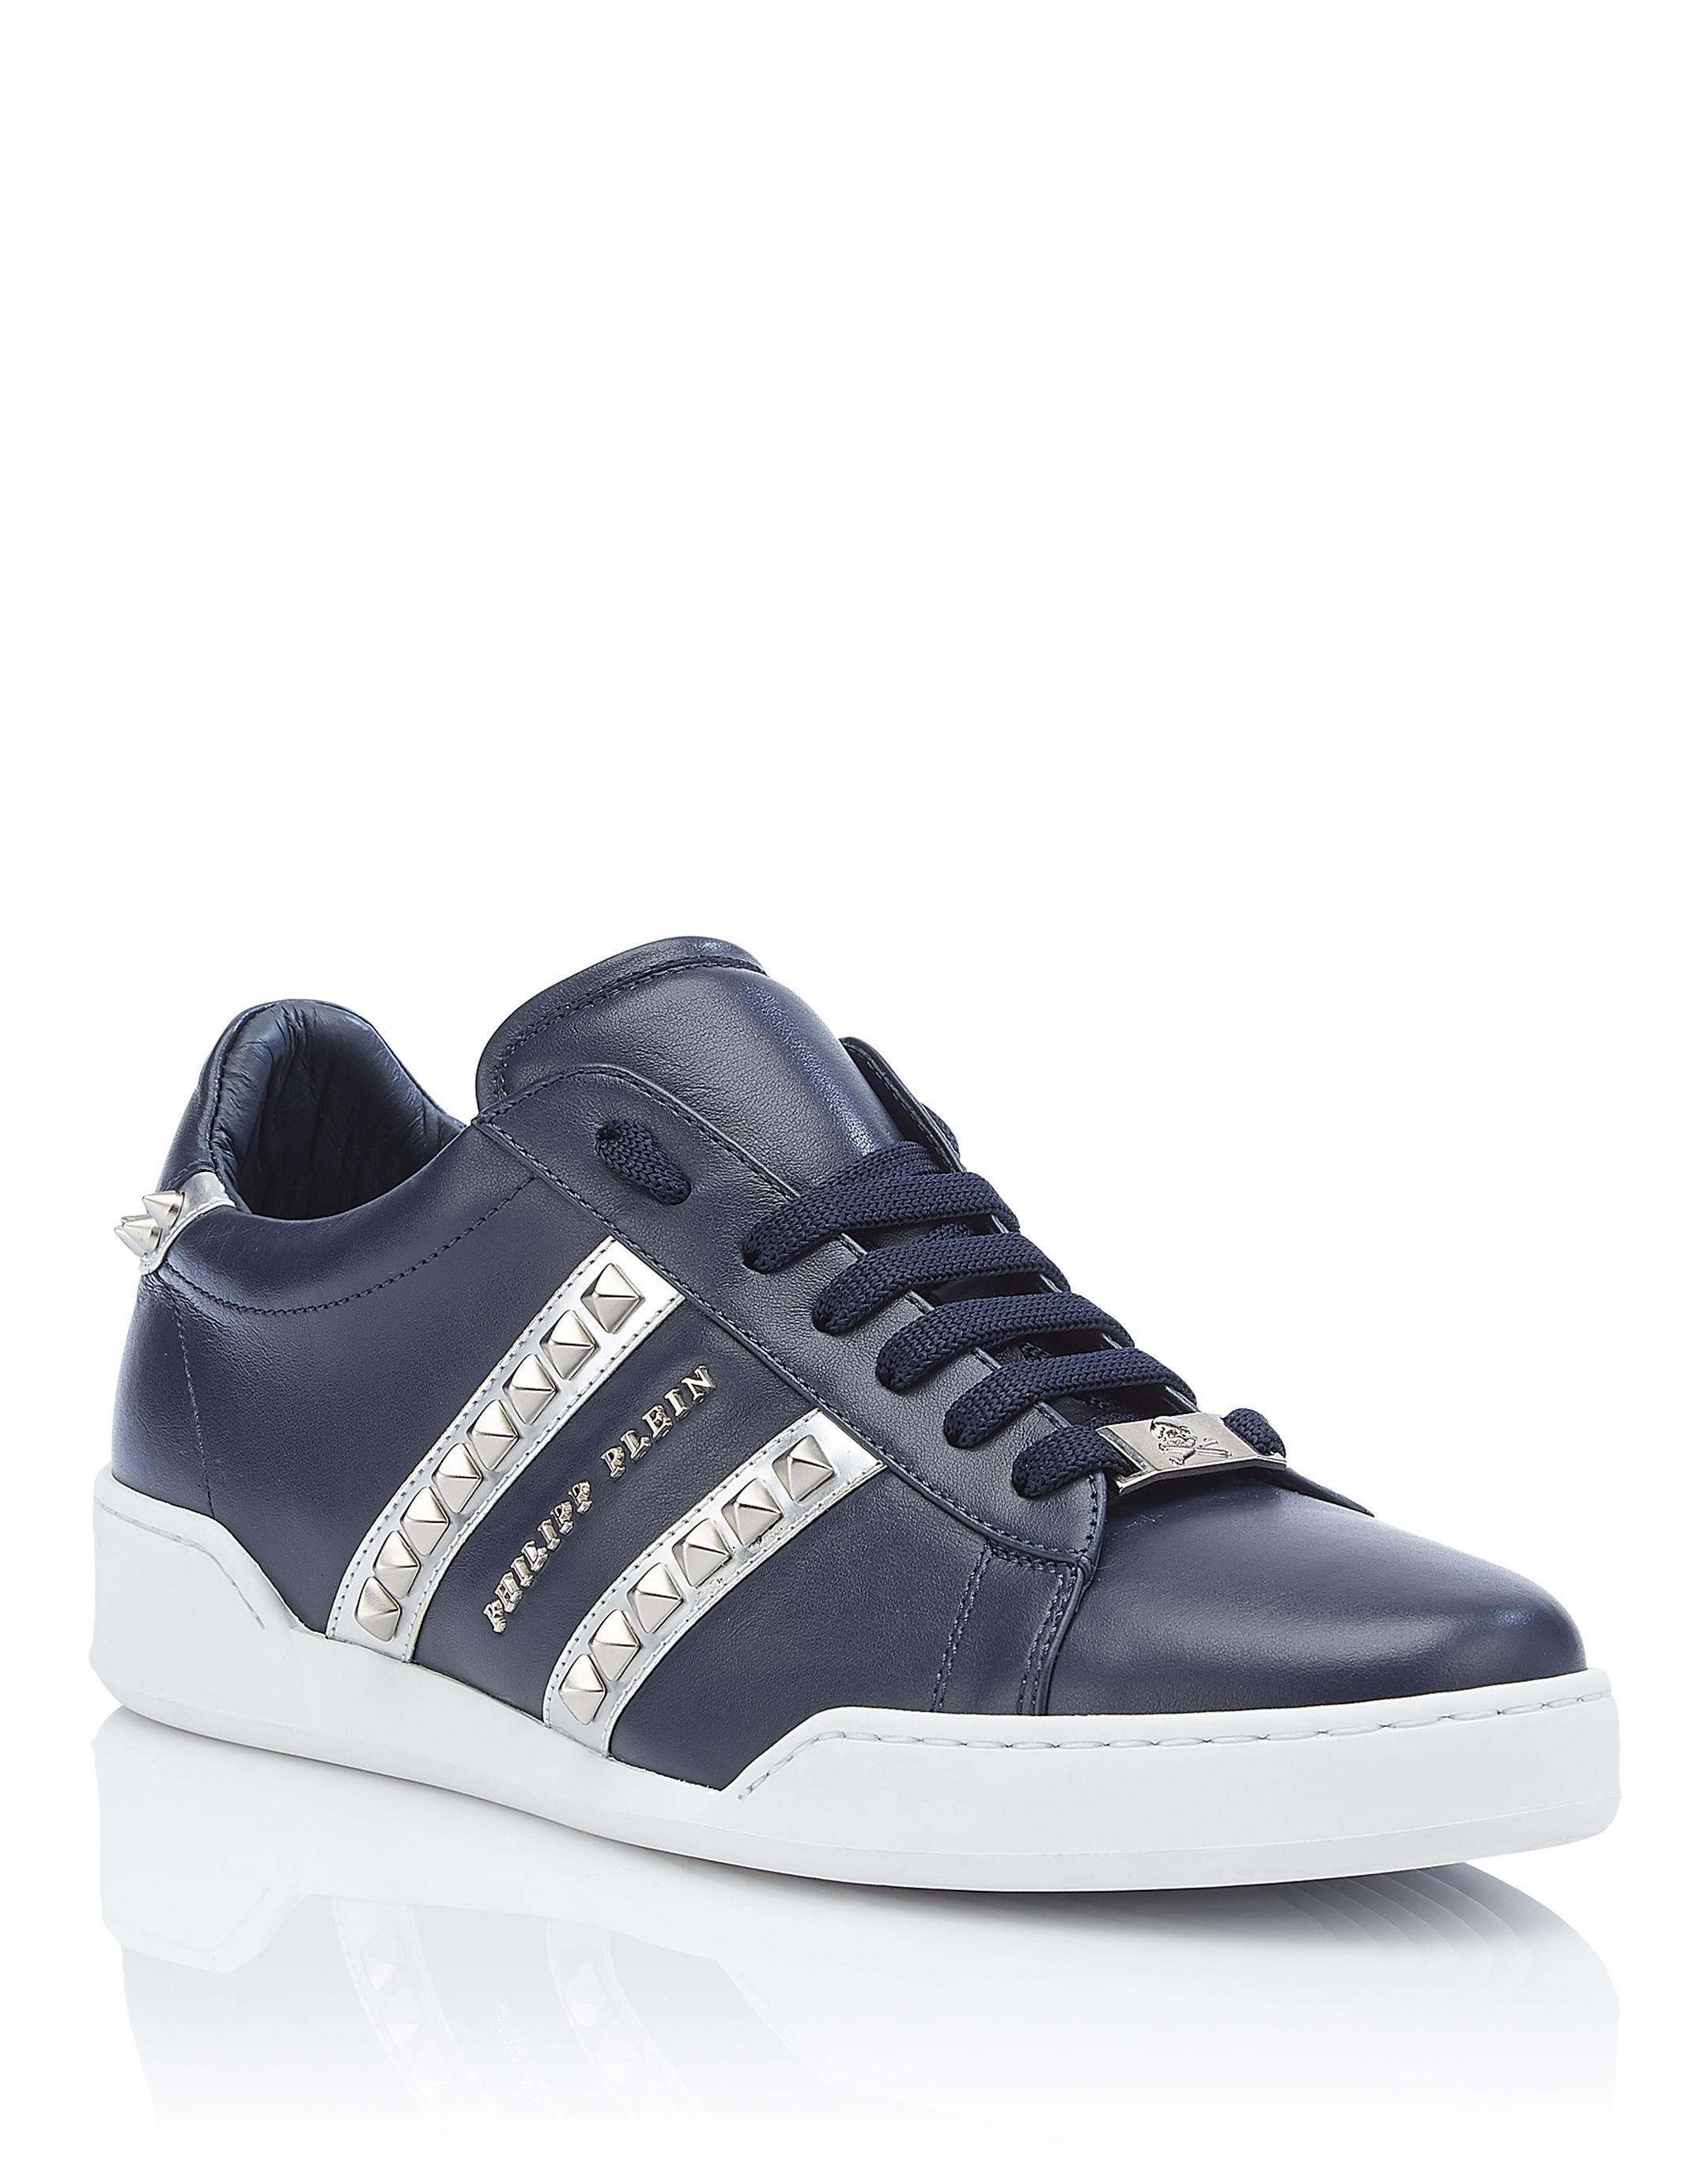 I Feel So Cool sneakers - Unavailable Philipp Plein Mt6Iv